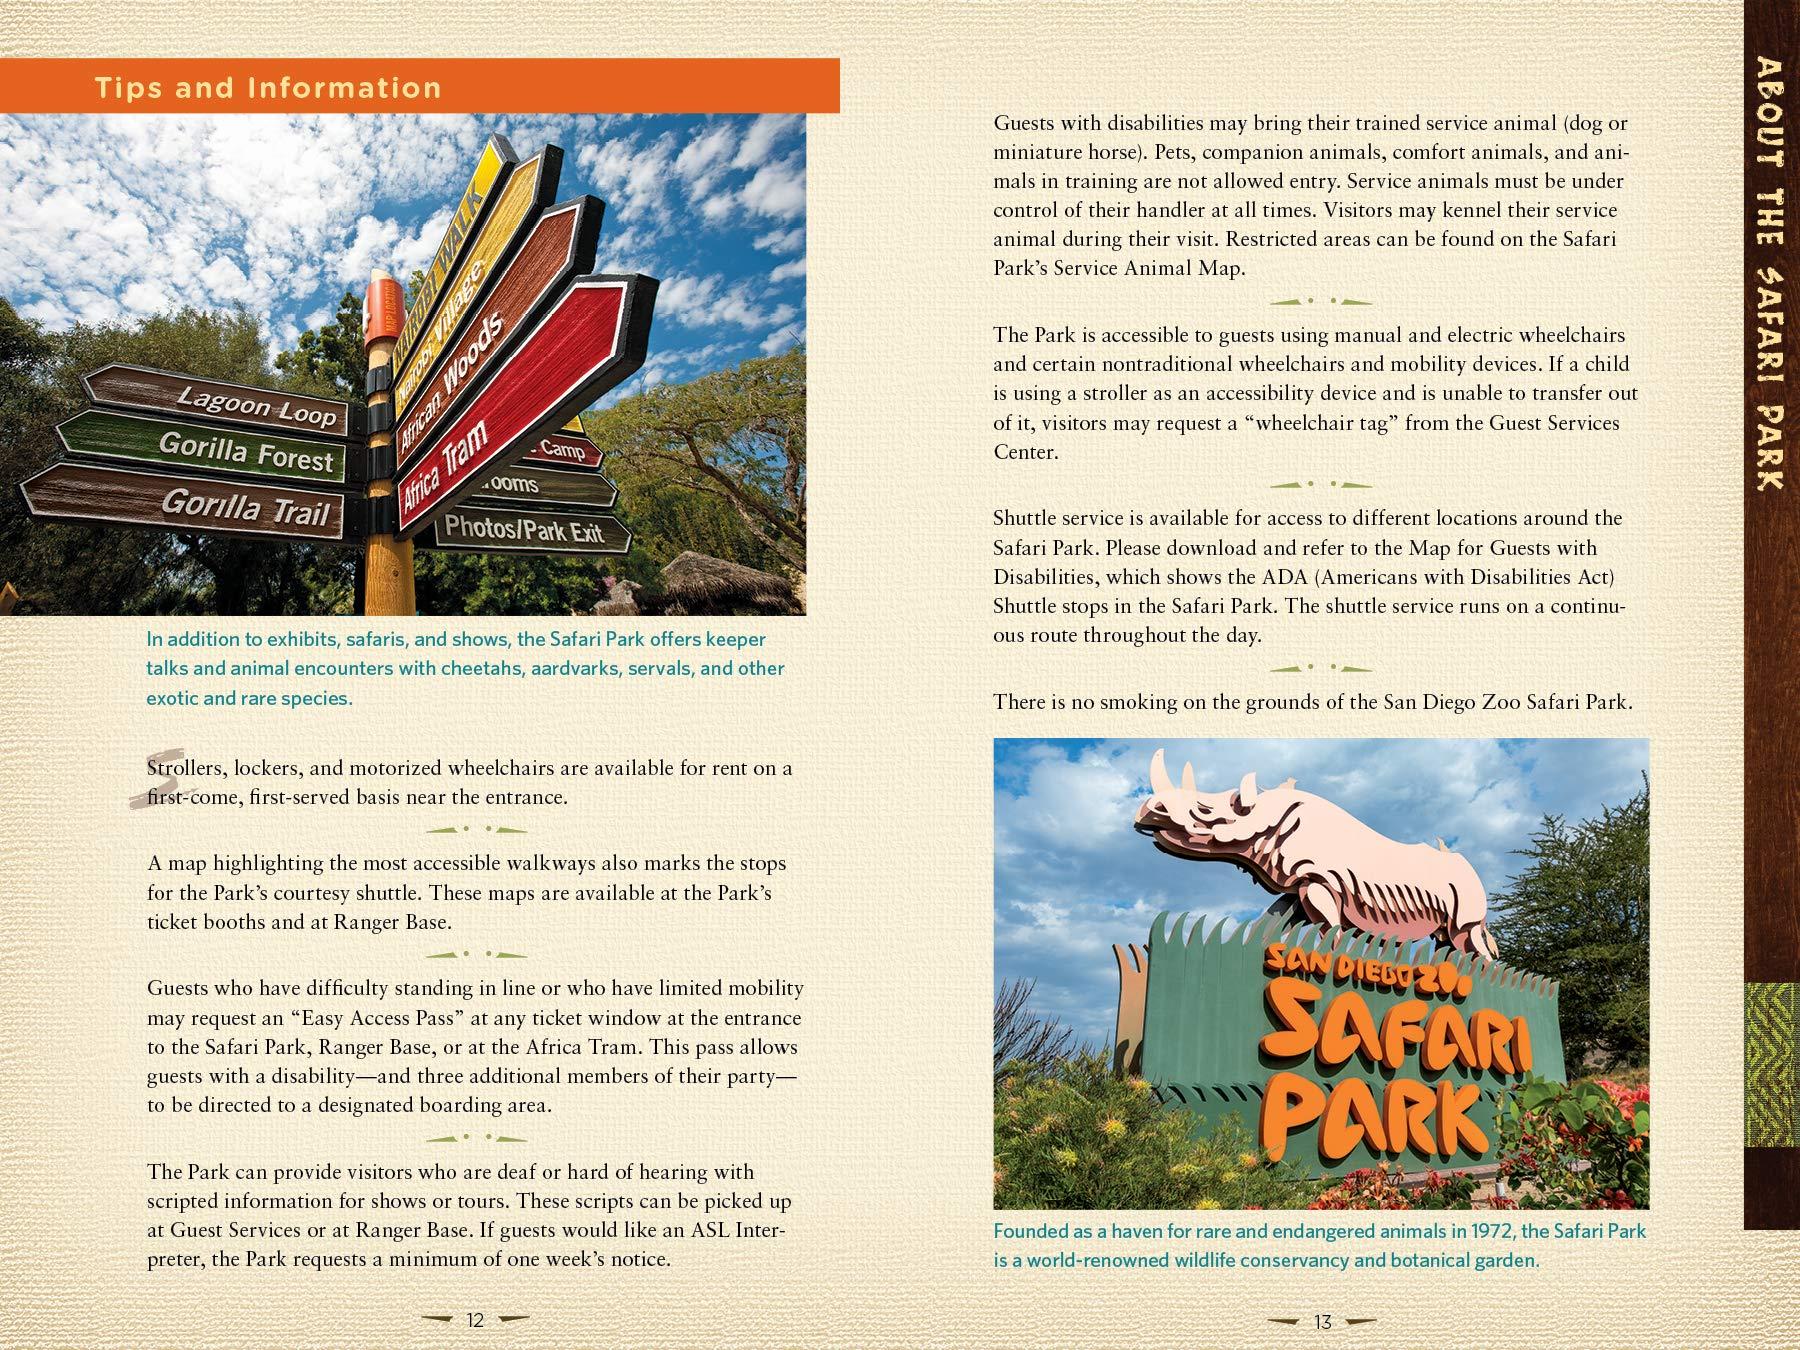 San Diego Zoo Safari Park Guidebook: San Diego Zoo Global